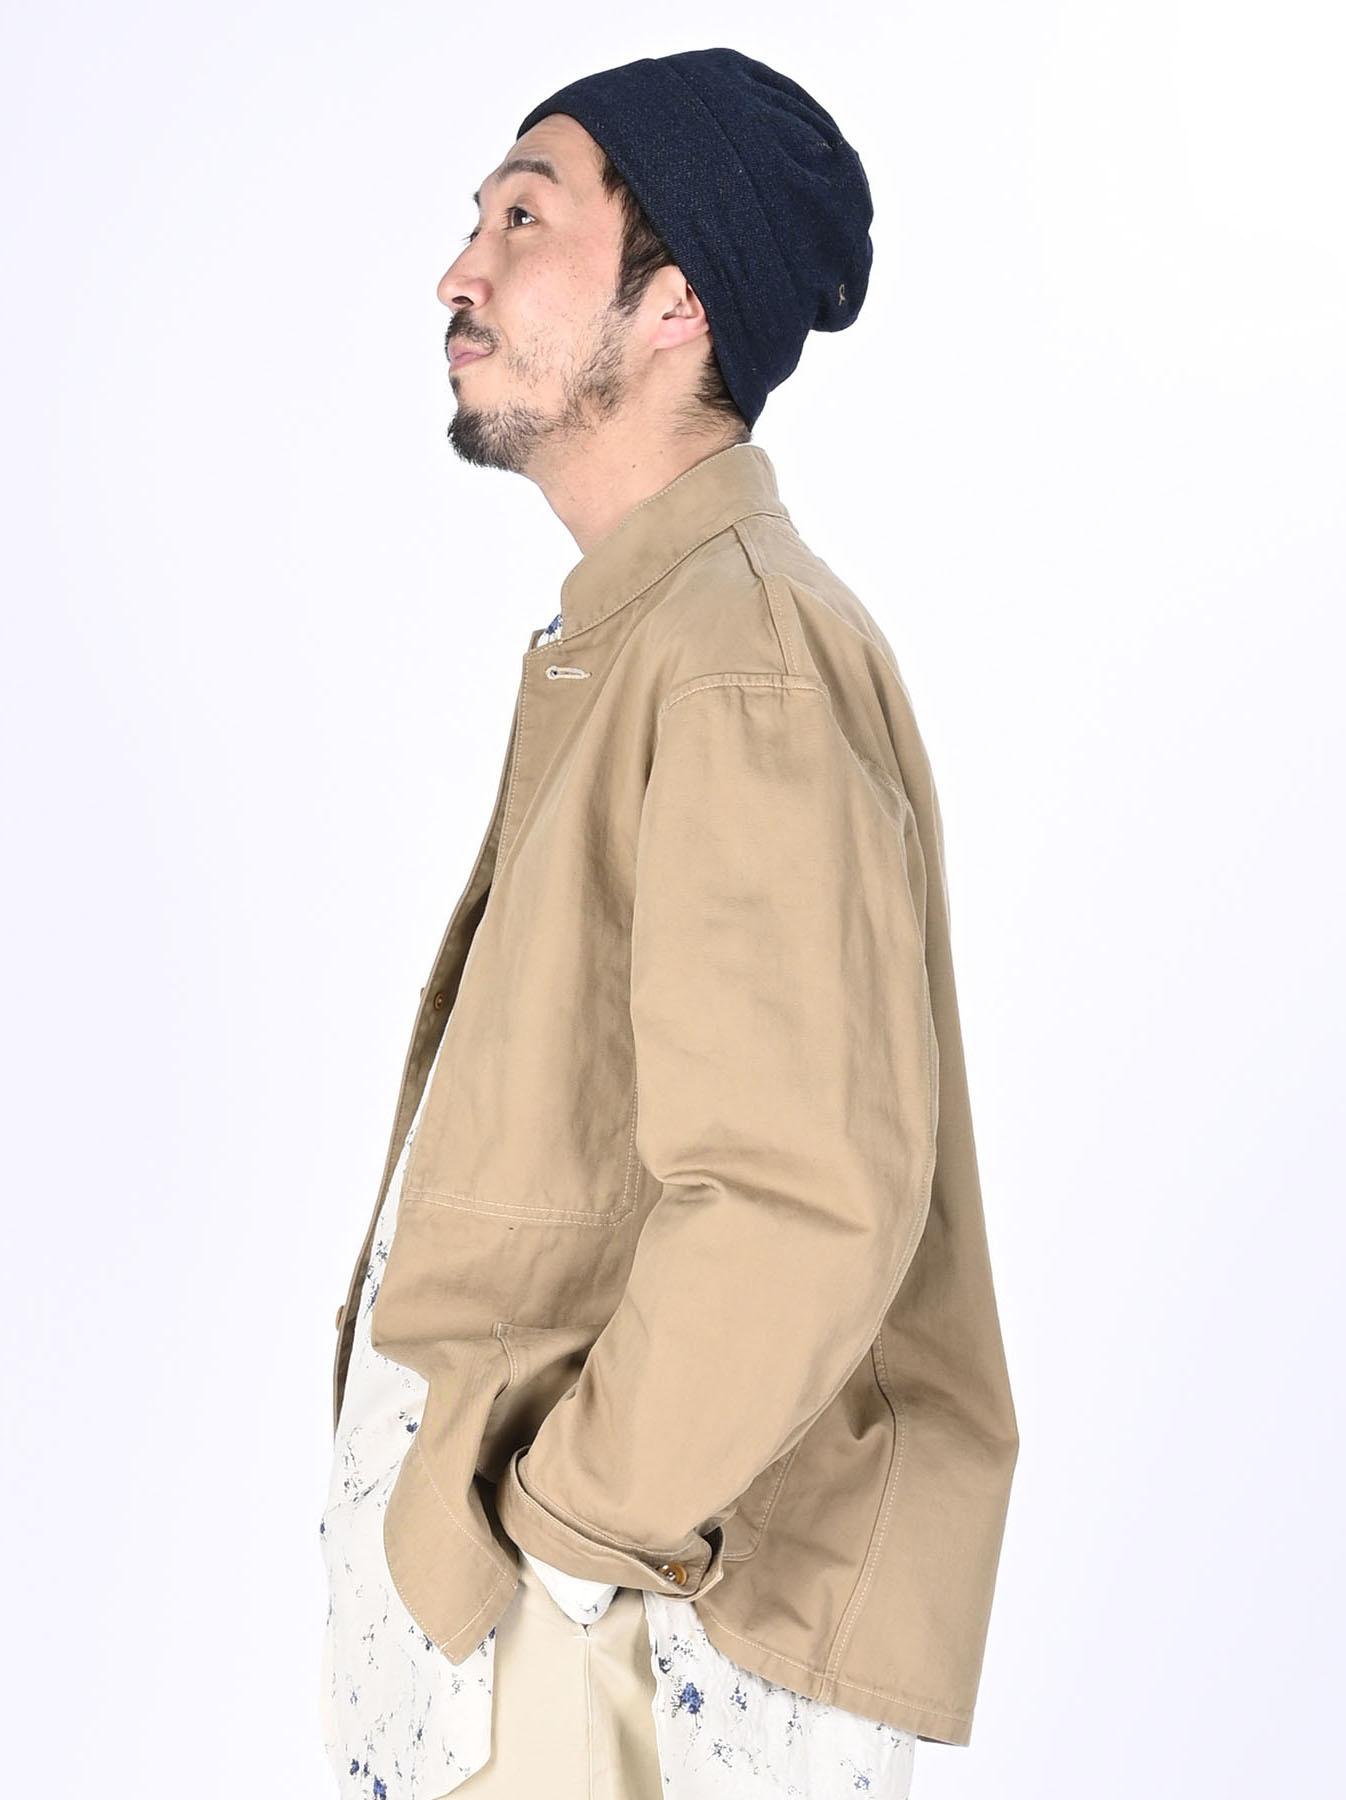 Okome Chino 908 Shirt Jacket-8